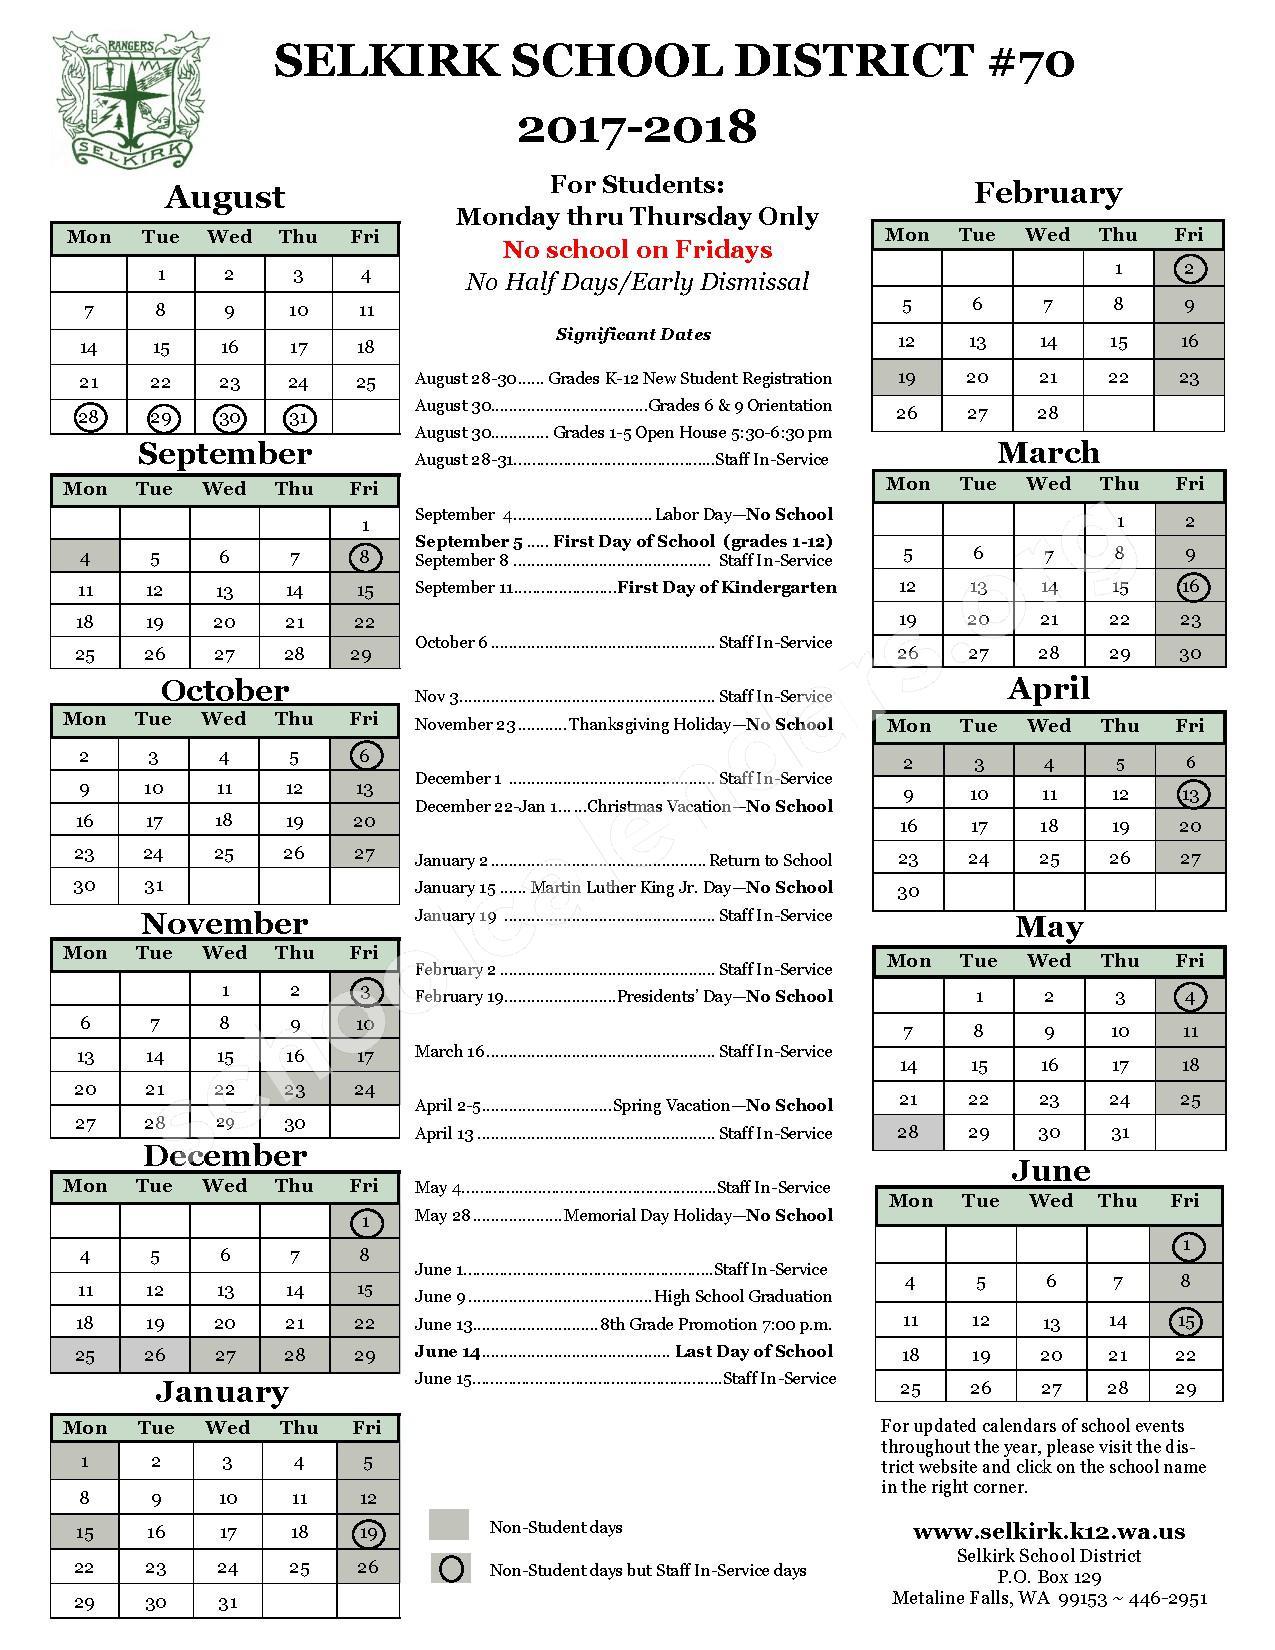 2017 - 2018 District Calendar – Wilbur School District – page 1